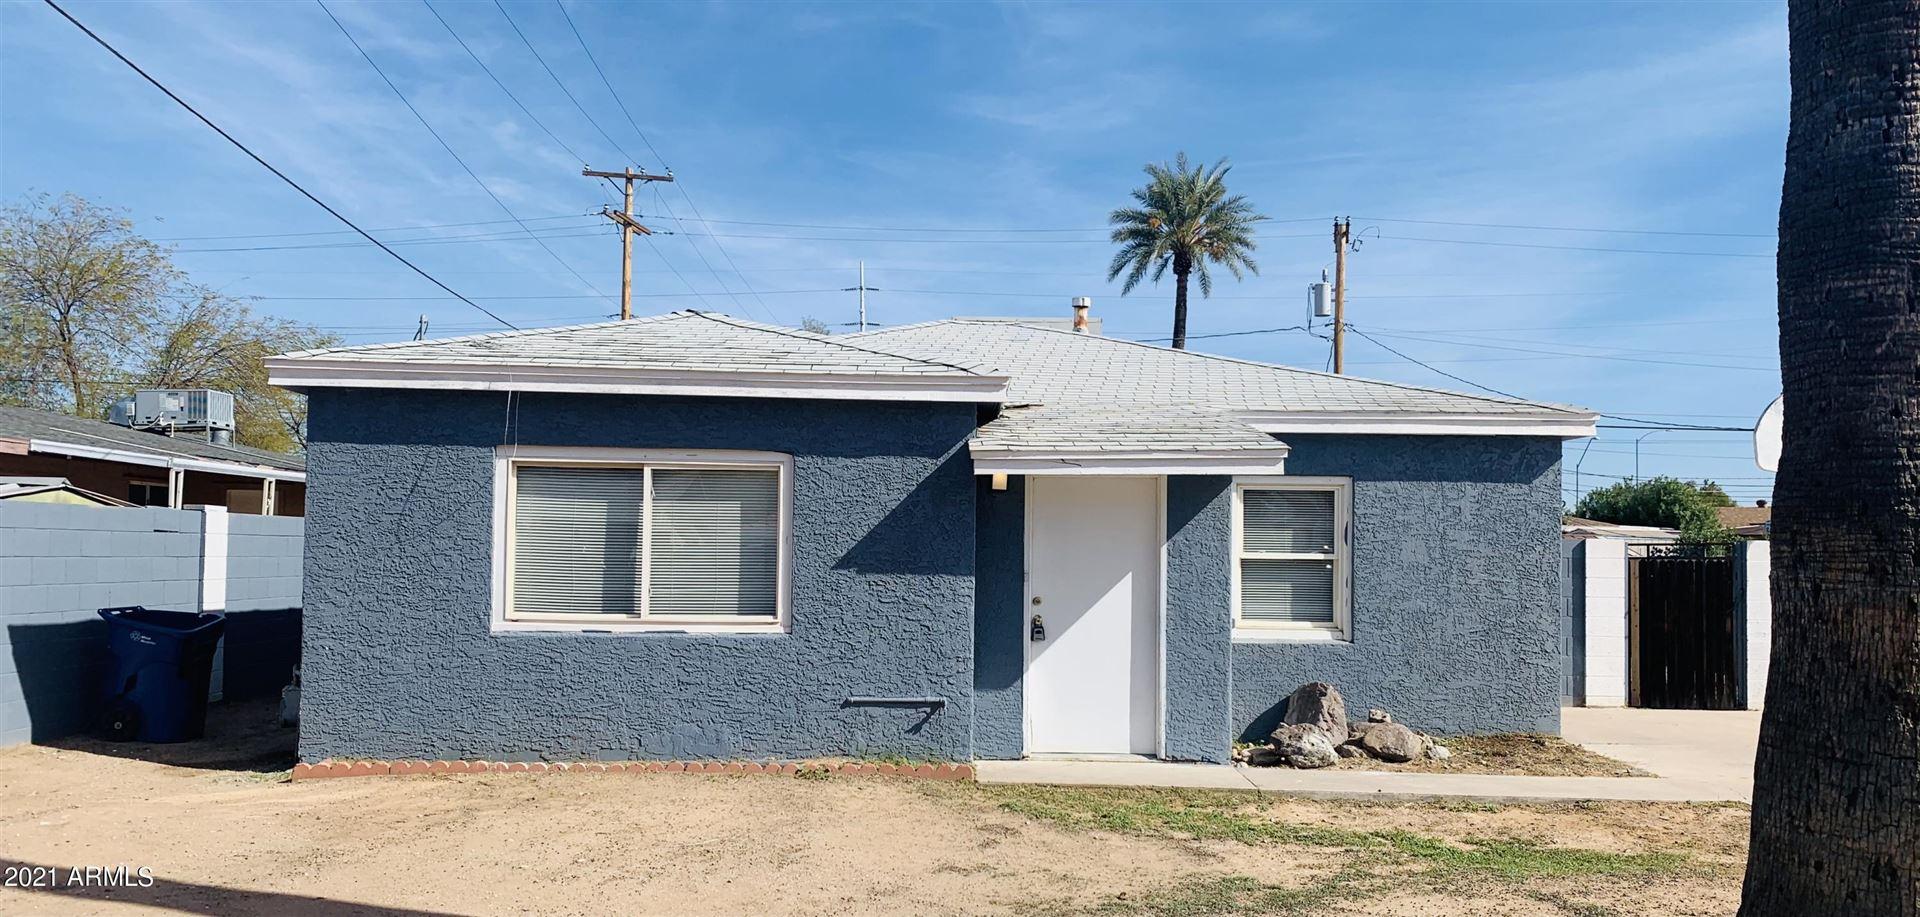 565 N DREW Street E, Mesa, AZ 85201 - MLS#: 6011276